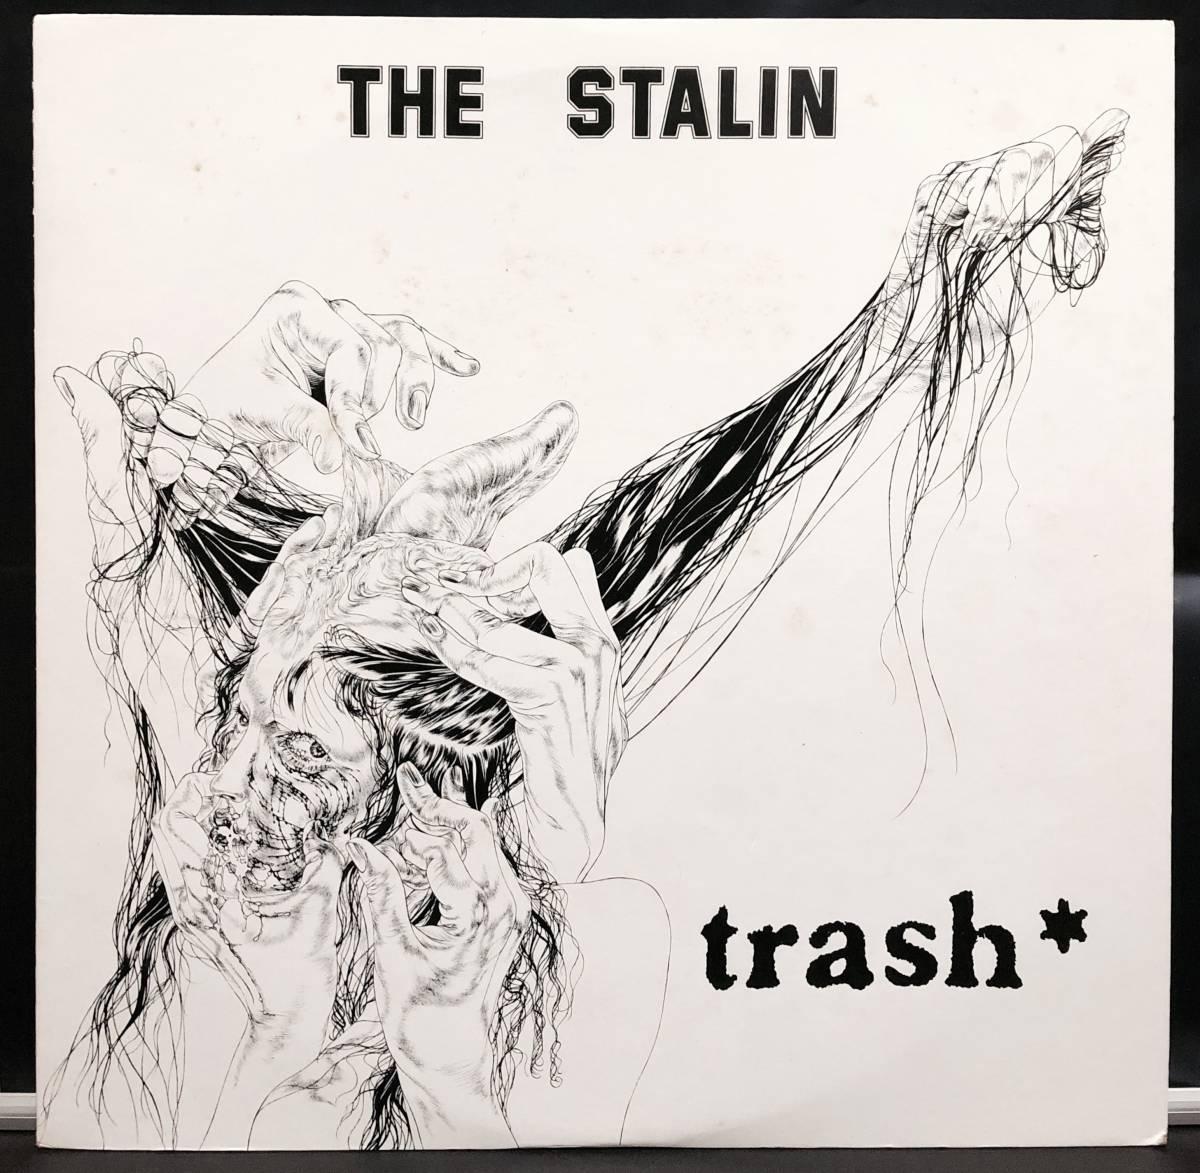 THE STALIN Trash 1981年オリジナル盤 遠藤ミチロウ 宮西計三